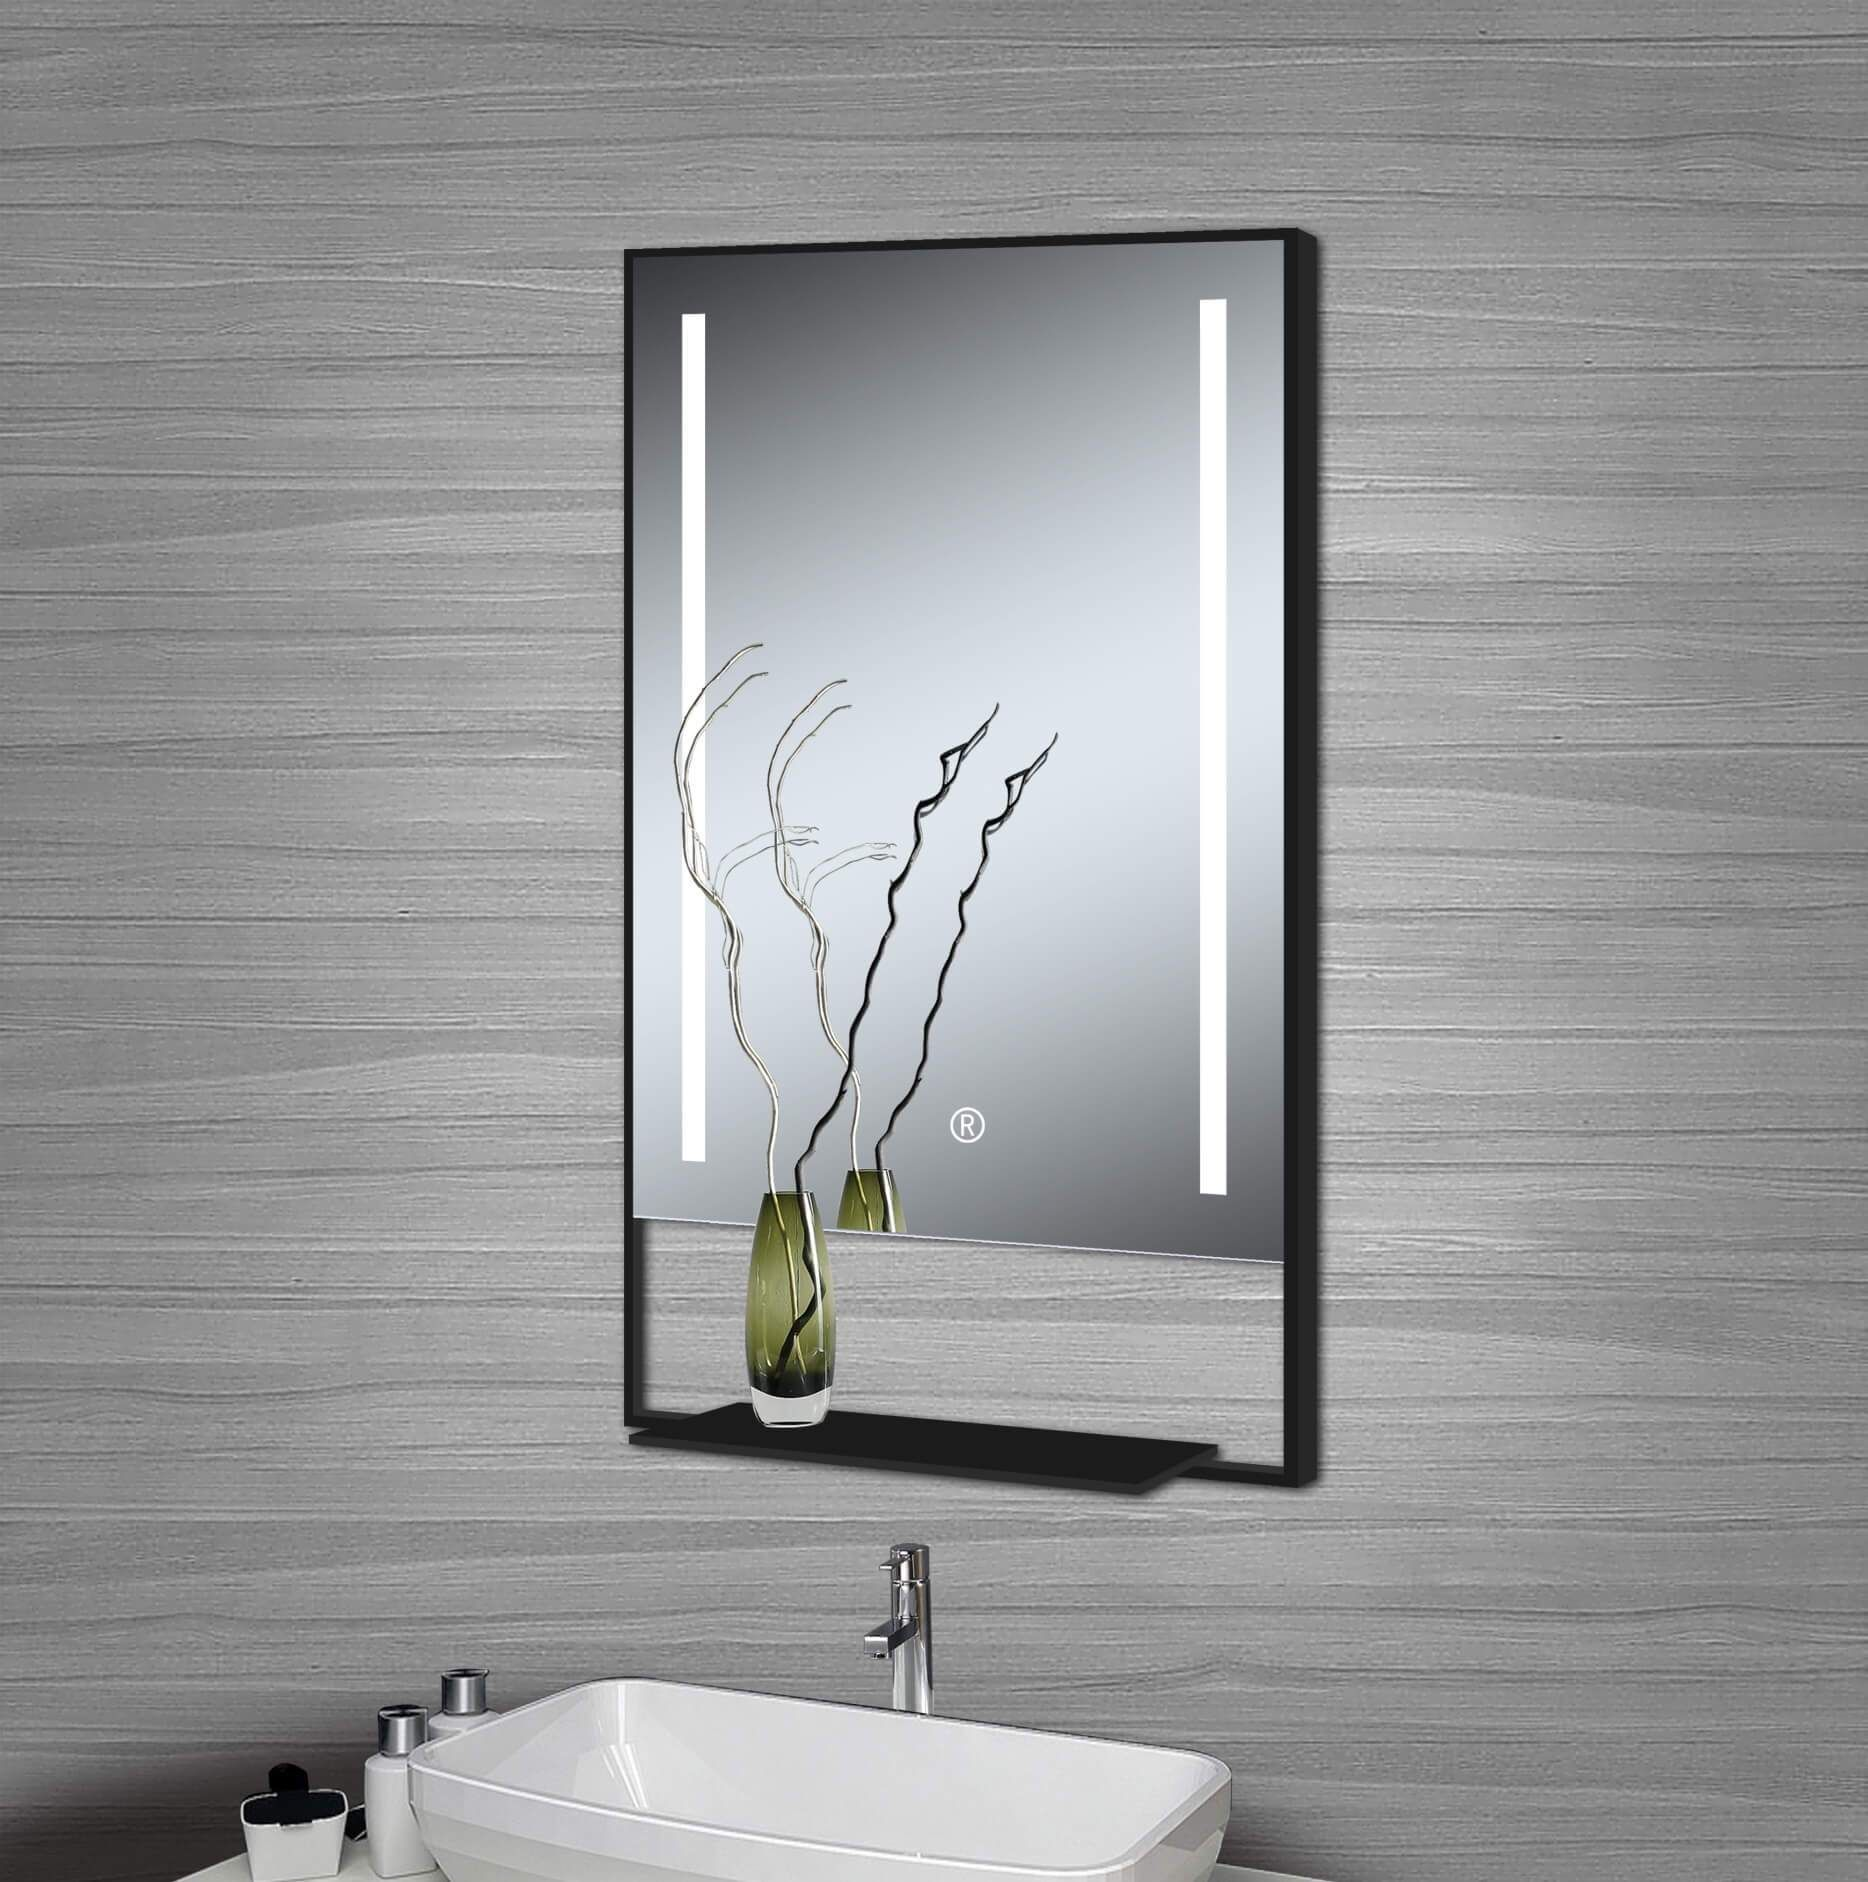 Chandel Wall Mounted 24 X32 Led Mirror With Glass Shelf Black Frame Led Mirror Bathroom Led Mirror Mirror